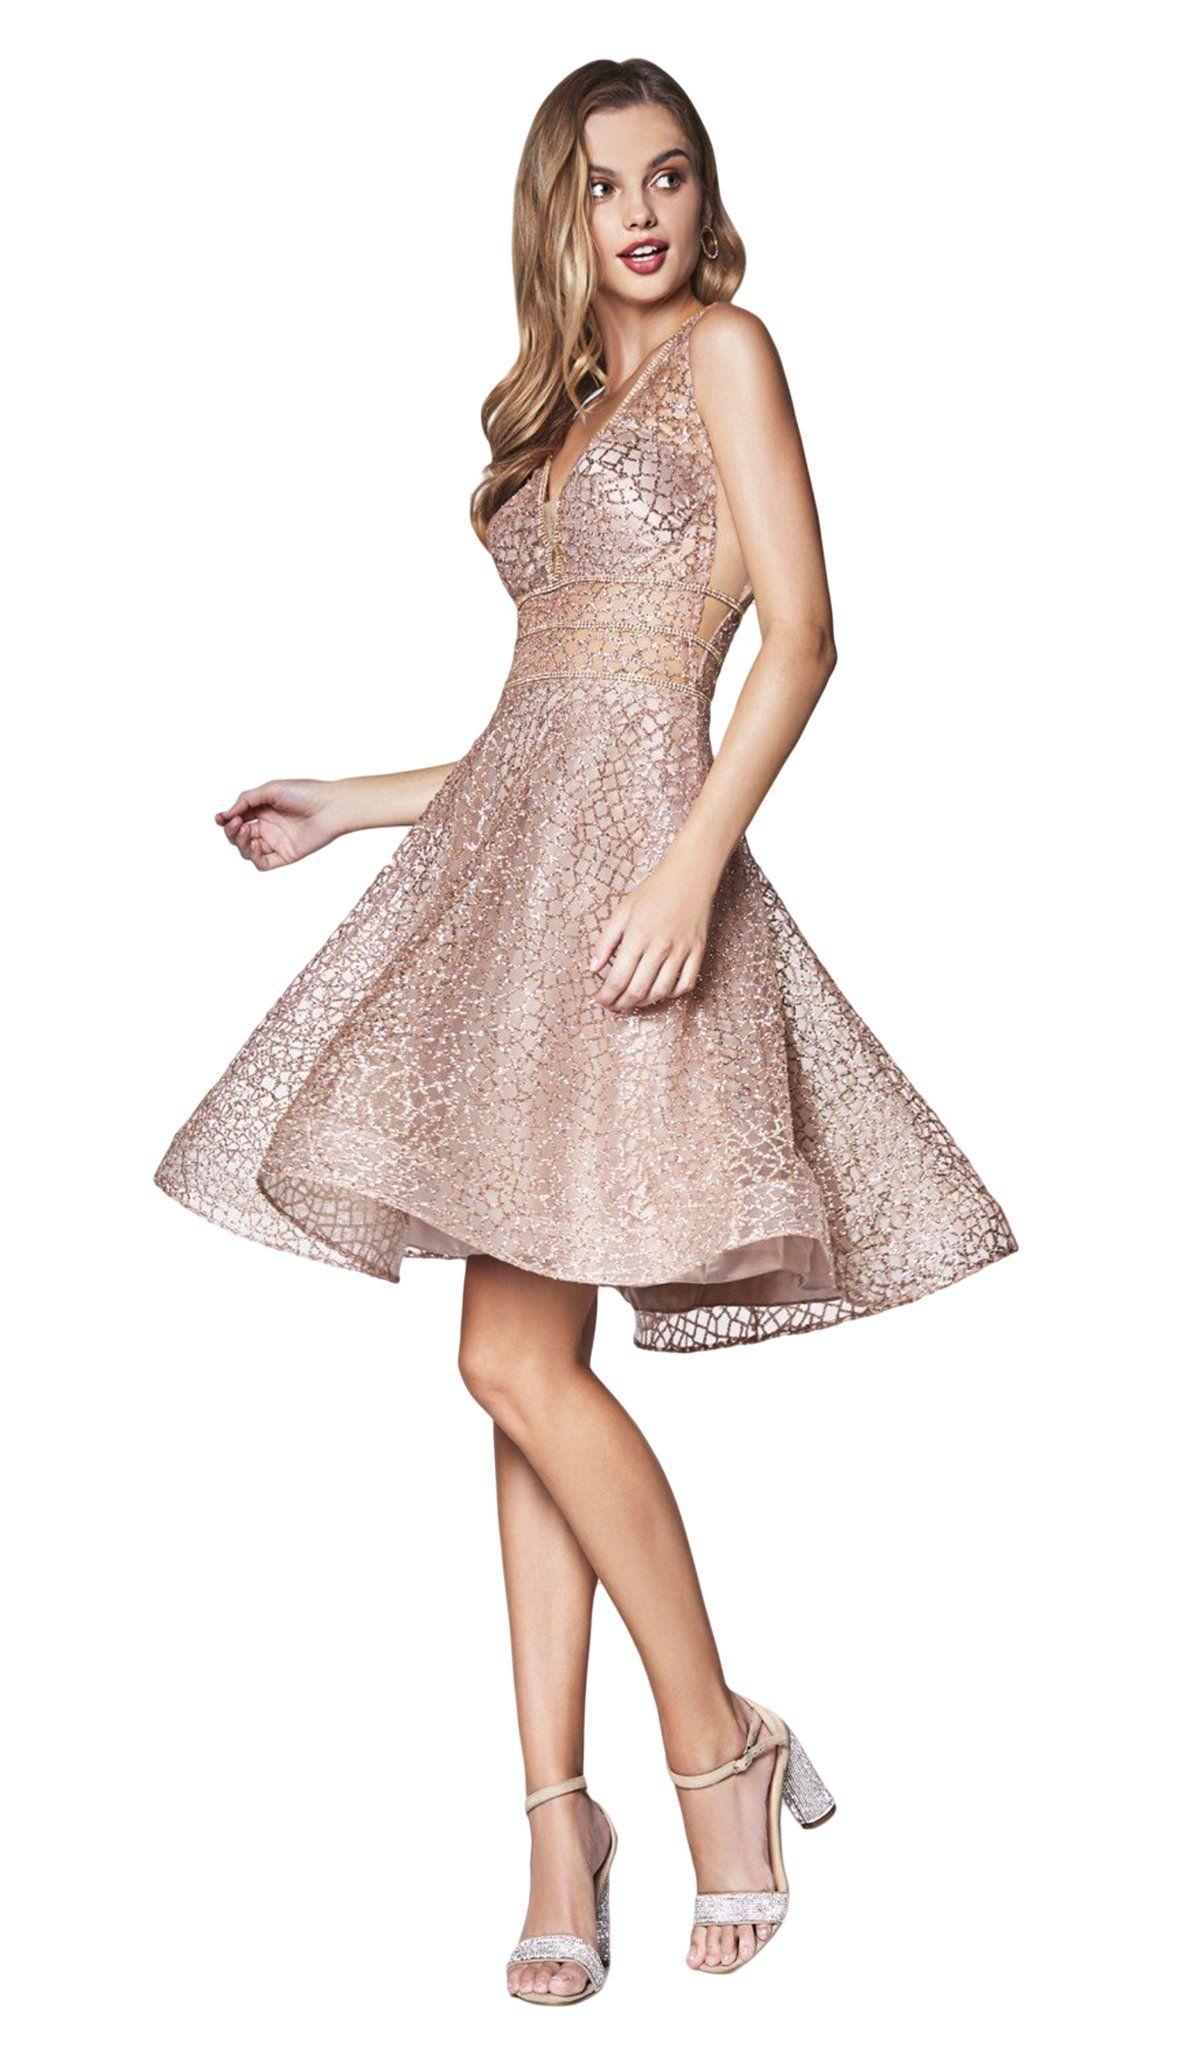 Cinderella Divine Cj256 S V Neck Metallic Glitter Cocktail Dress Dresses Short Cocktail Dress A Line Cocktail Dress [ 2048 x 1200 Pixel ]